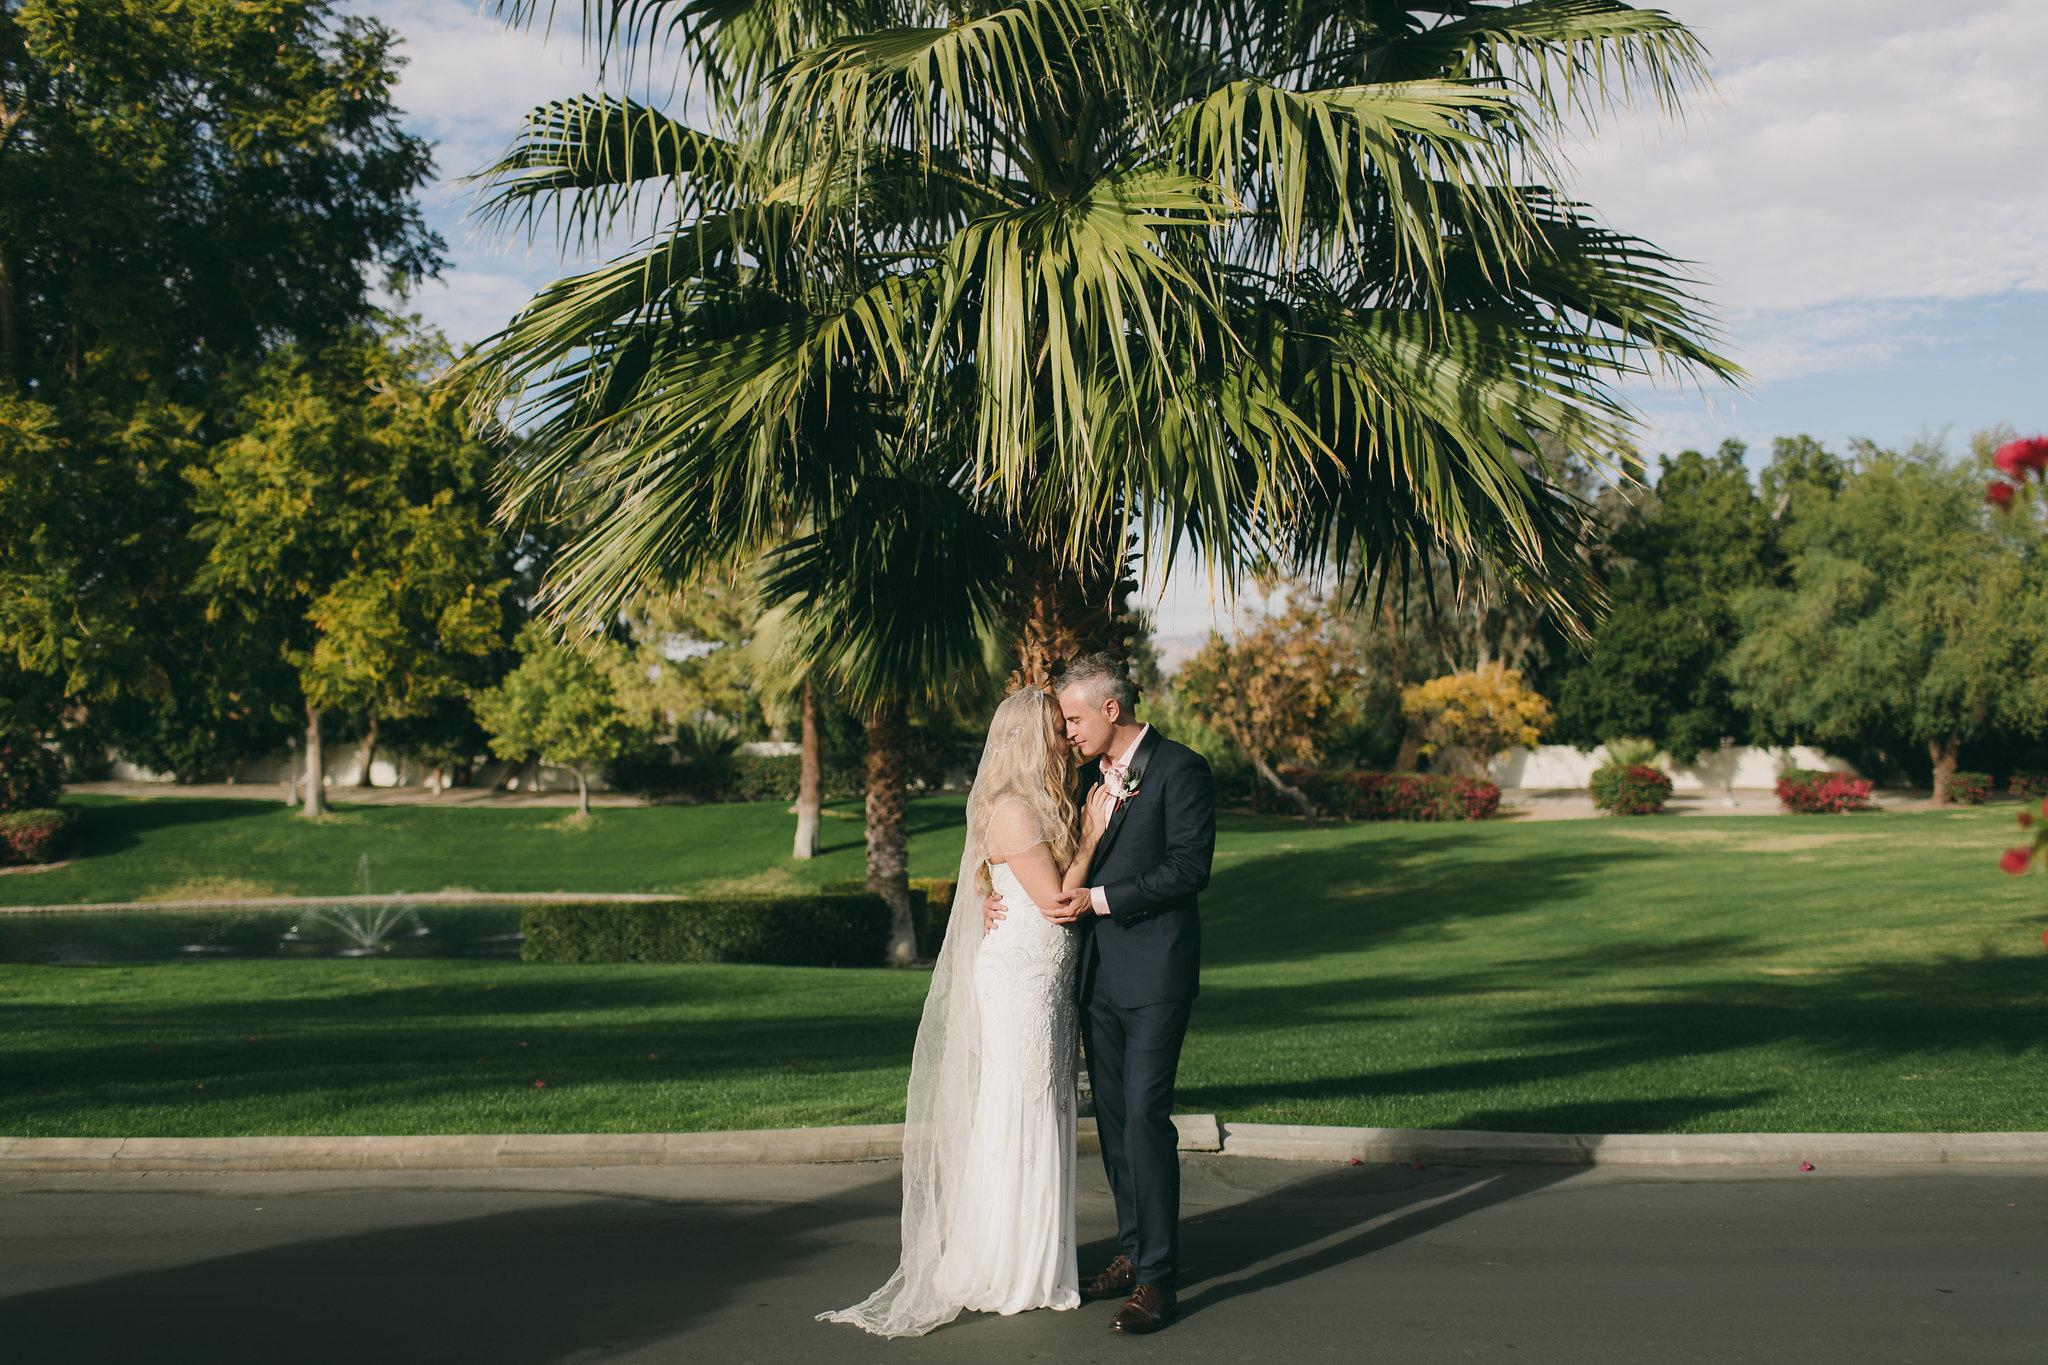 Gracy-Andrew-Wedding-174.jpg